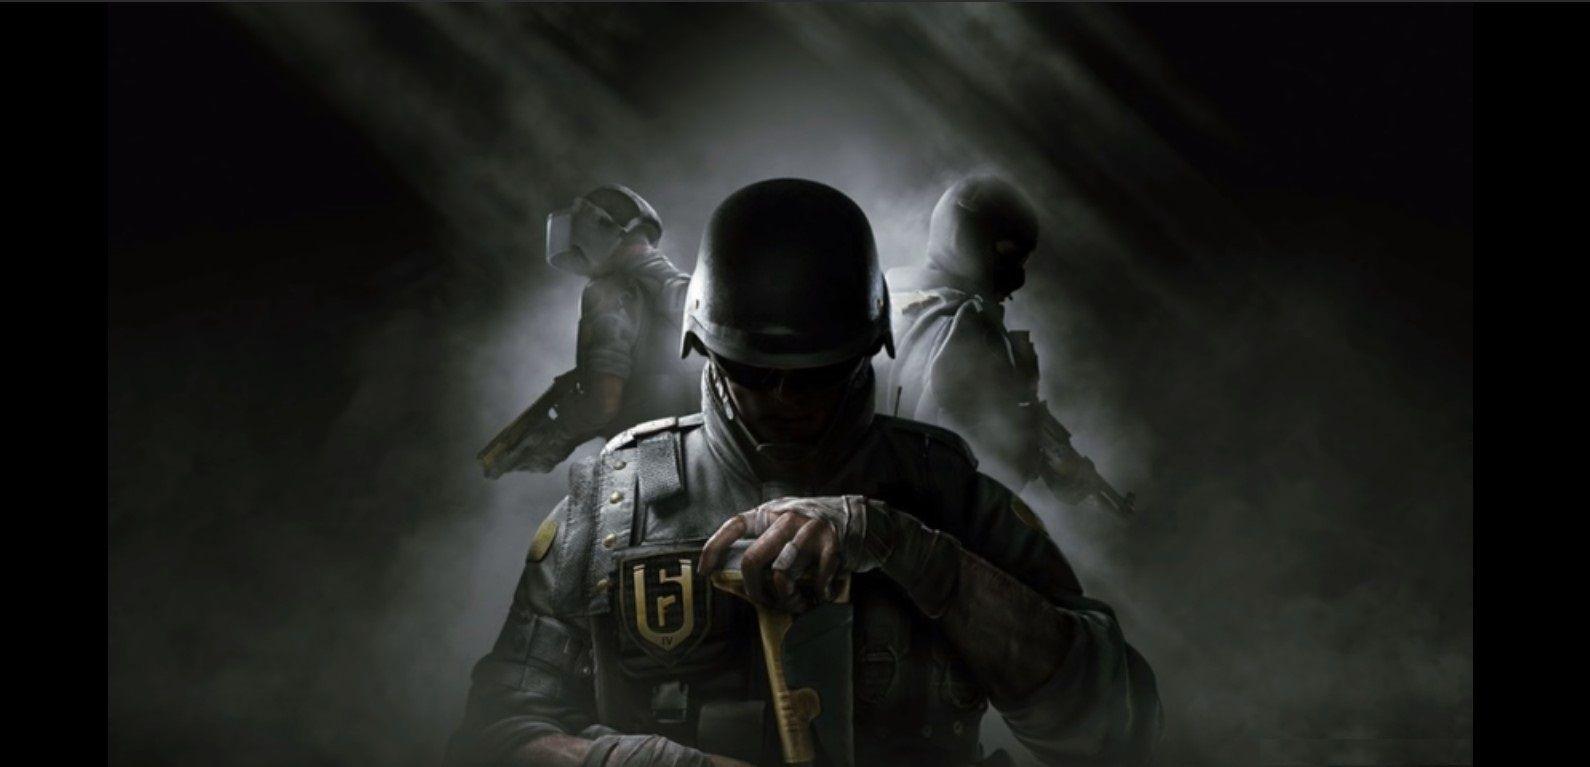 Dark Souls 2 Image By Tim Moore Ubisoft Hd Images Hd Wallpaper